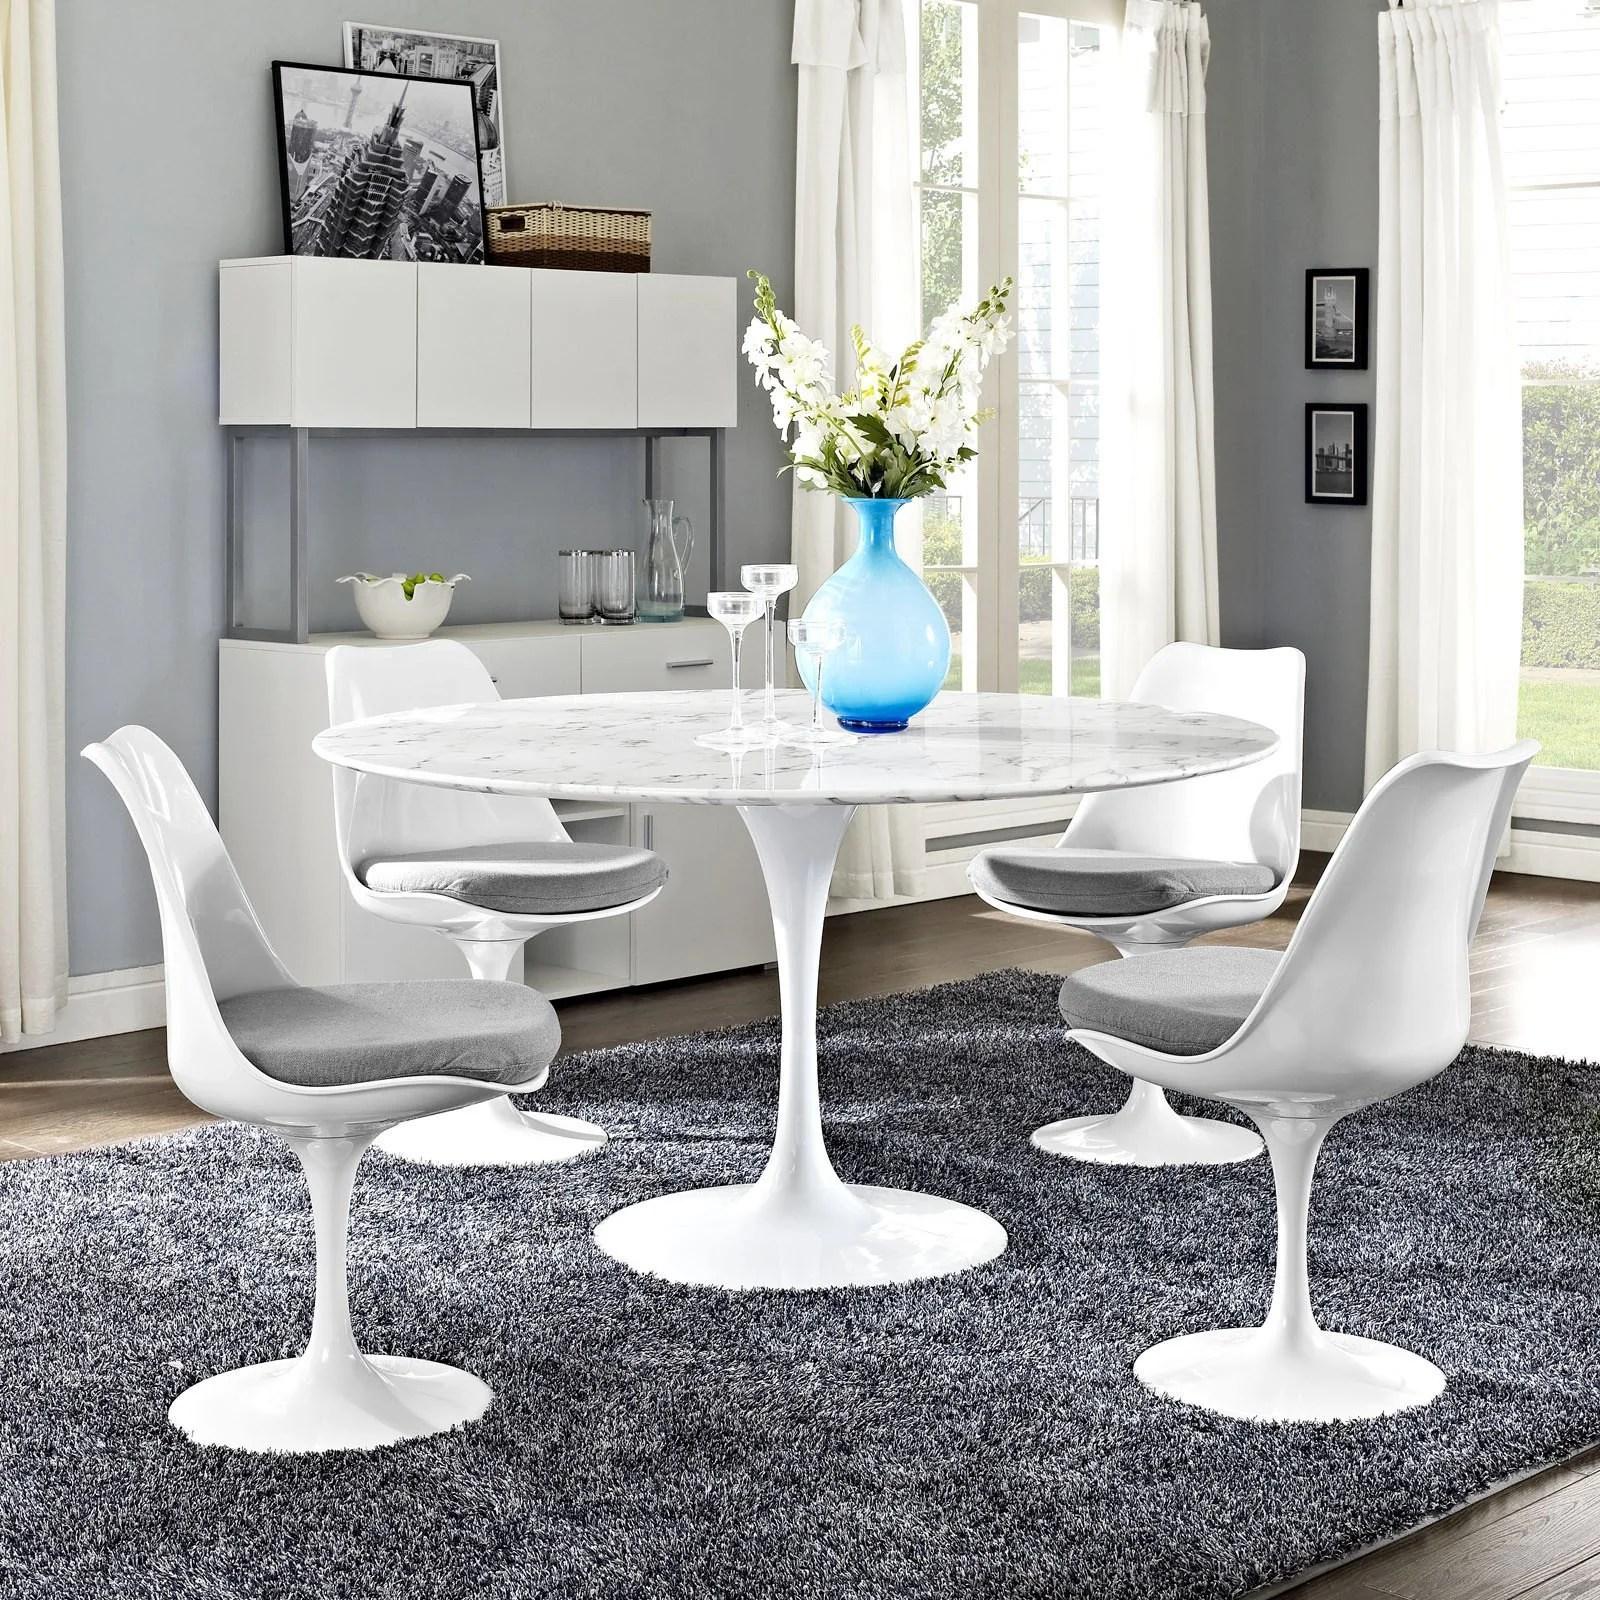 "Tulip Style 54"" Marble Dining Table - Emfurn"